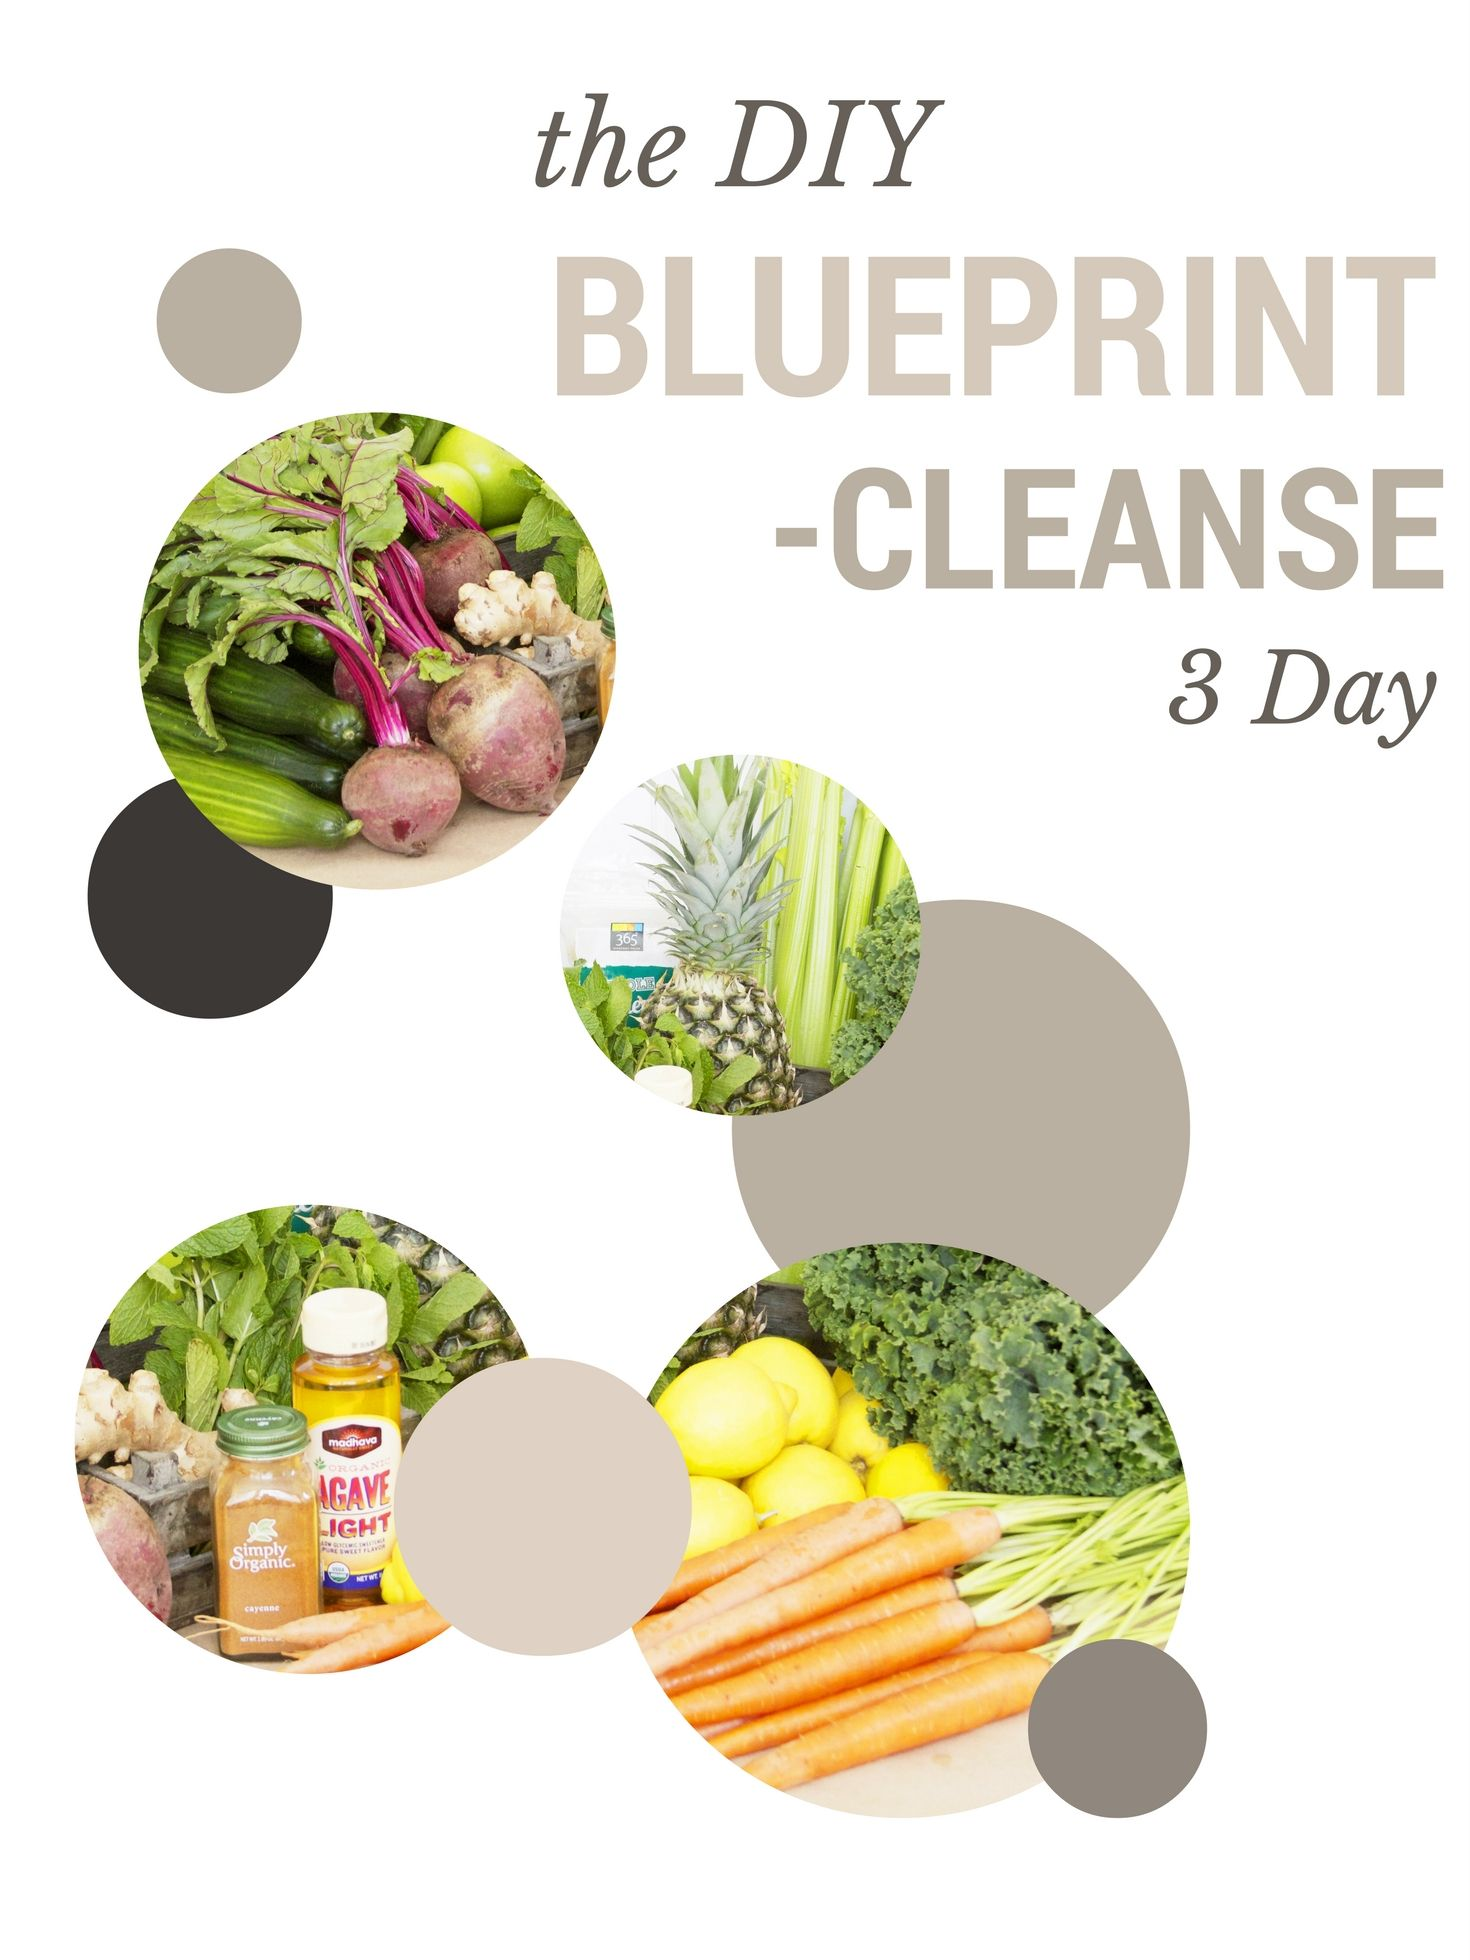 Diy blueprint cleanse blueprint cleanse cabbage soup diet and diy blueprint cleanse malvernweather Choice Image